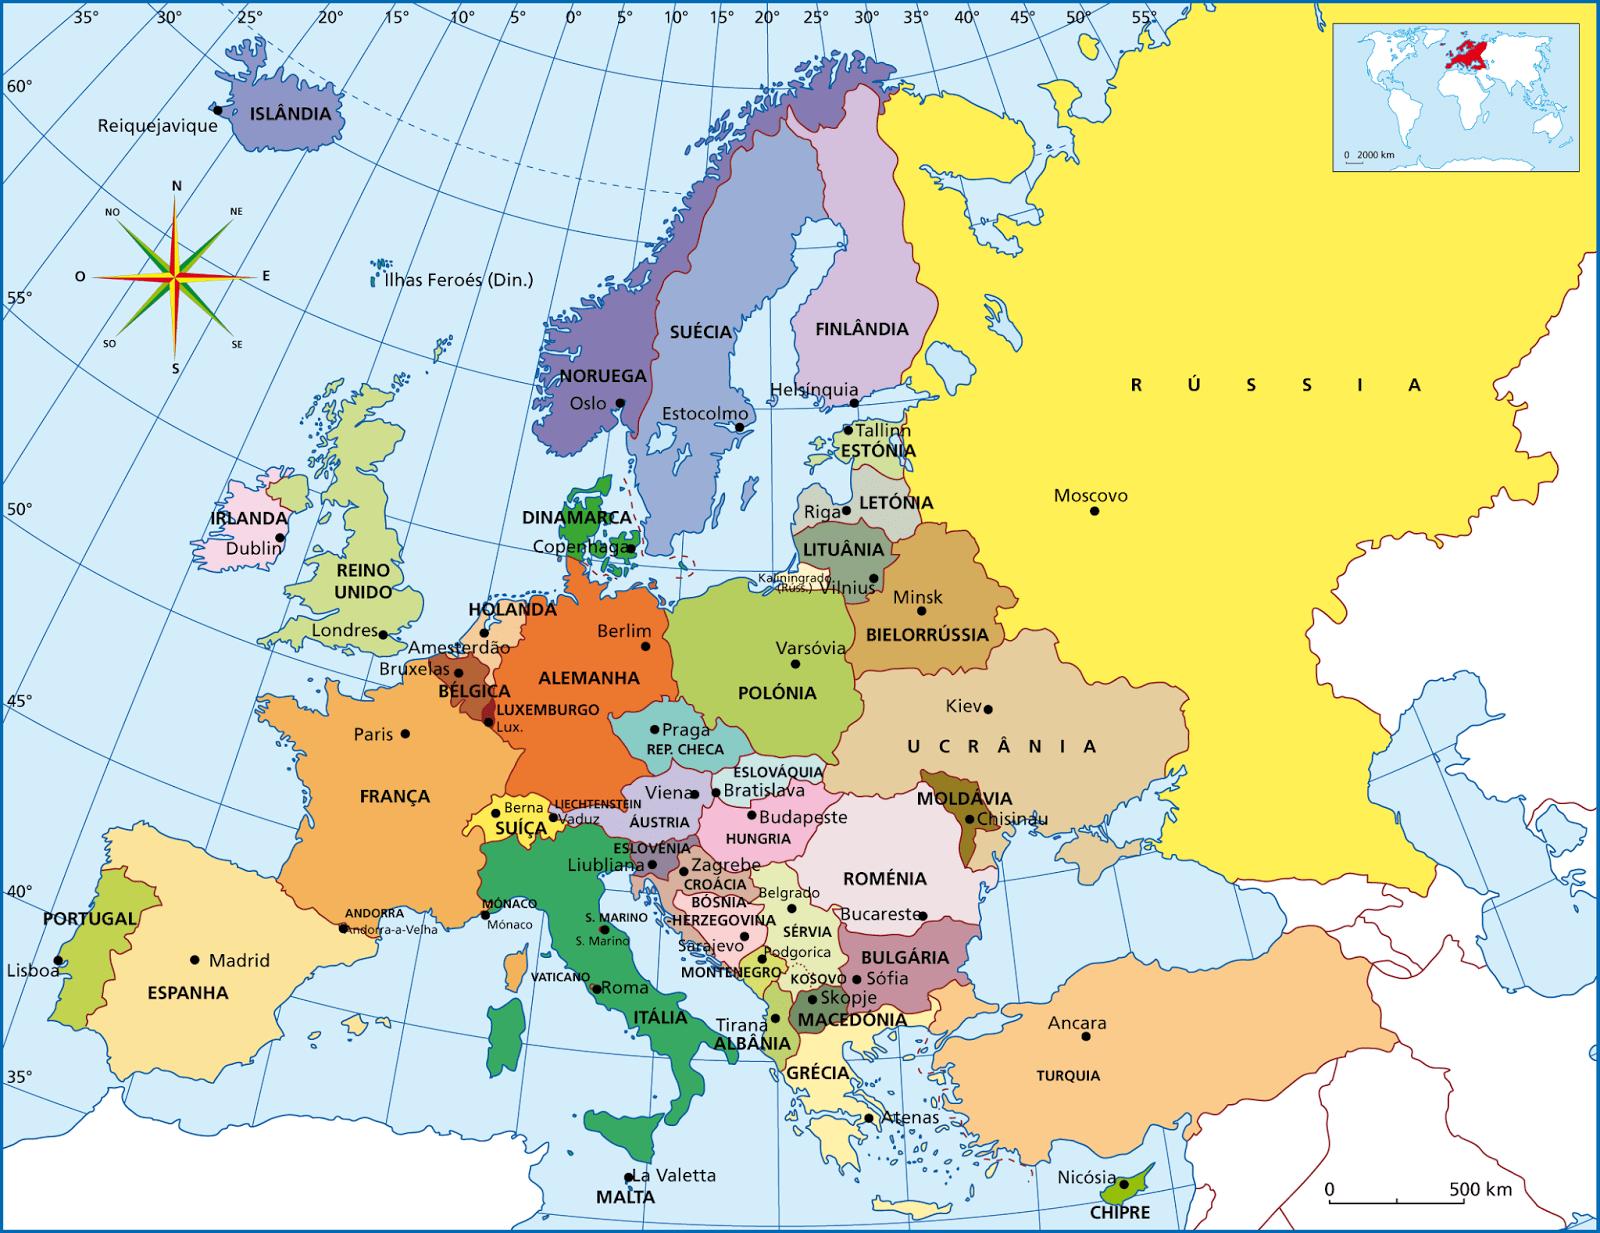 paises y capitales de europa